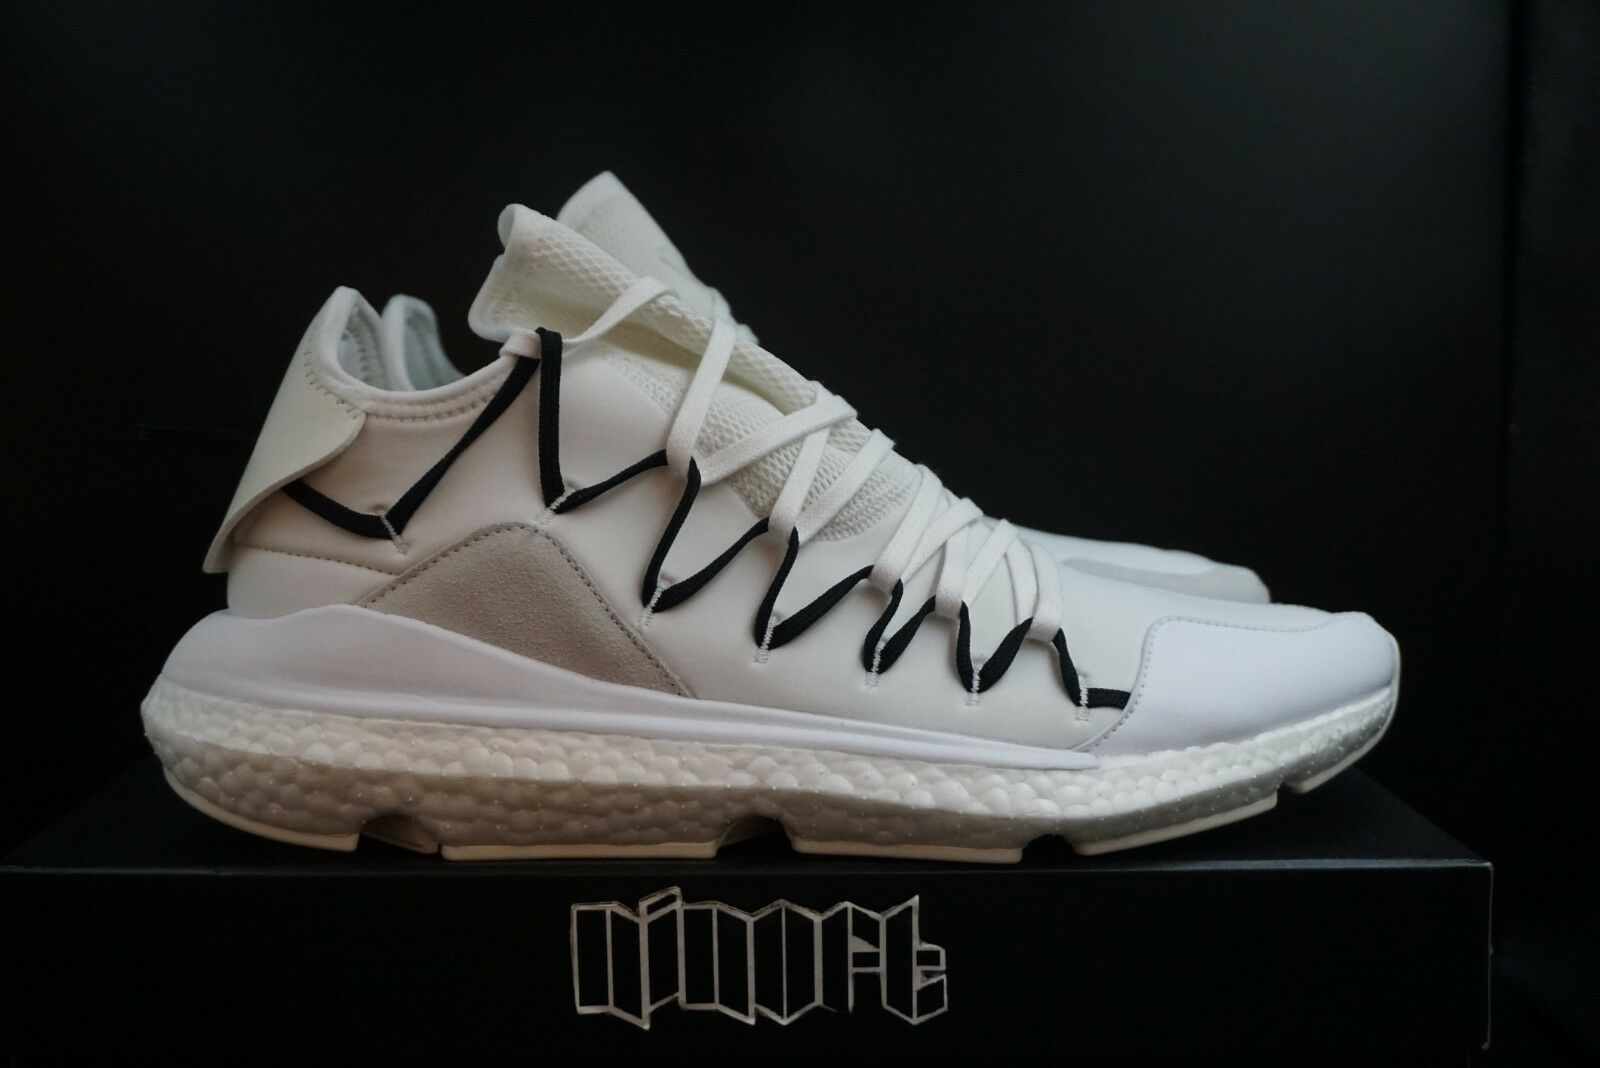 sports shoes 622fe 83694 Adidas Adidas Y-3 Yohji Yamamoto Kusari Boost Core White BC0956 Size 10.5 -  Hi-Top Sneakers for Sale - Grailed